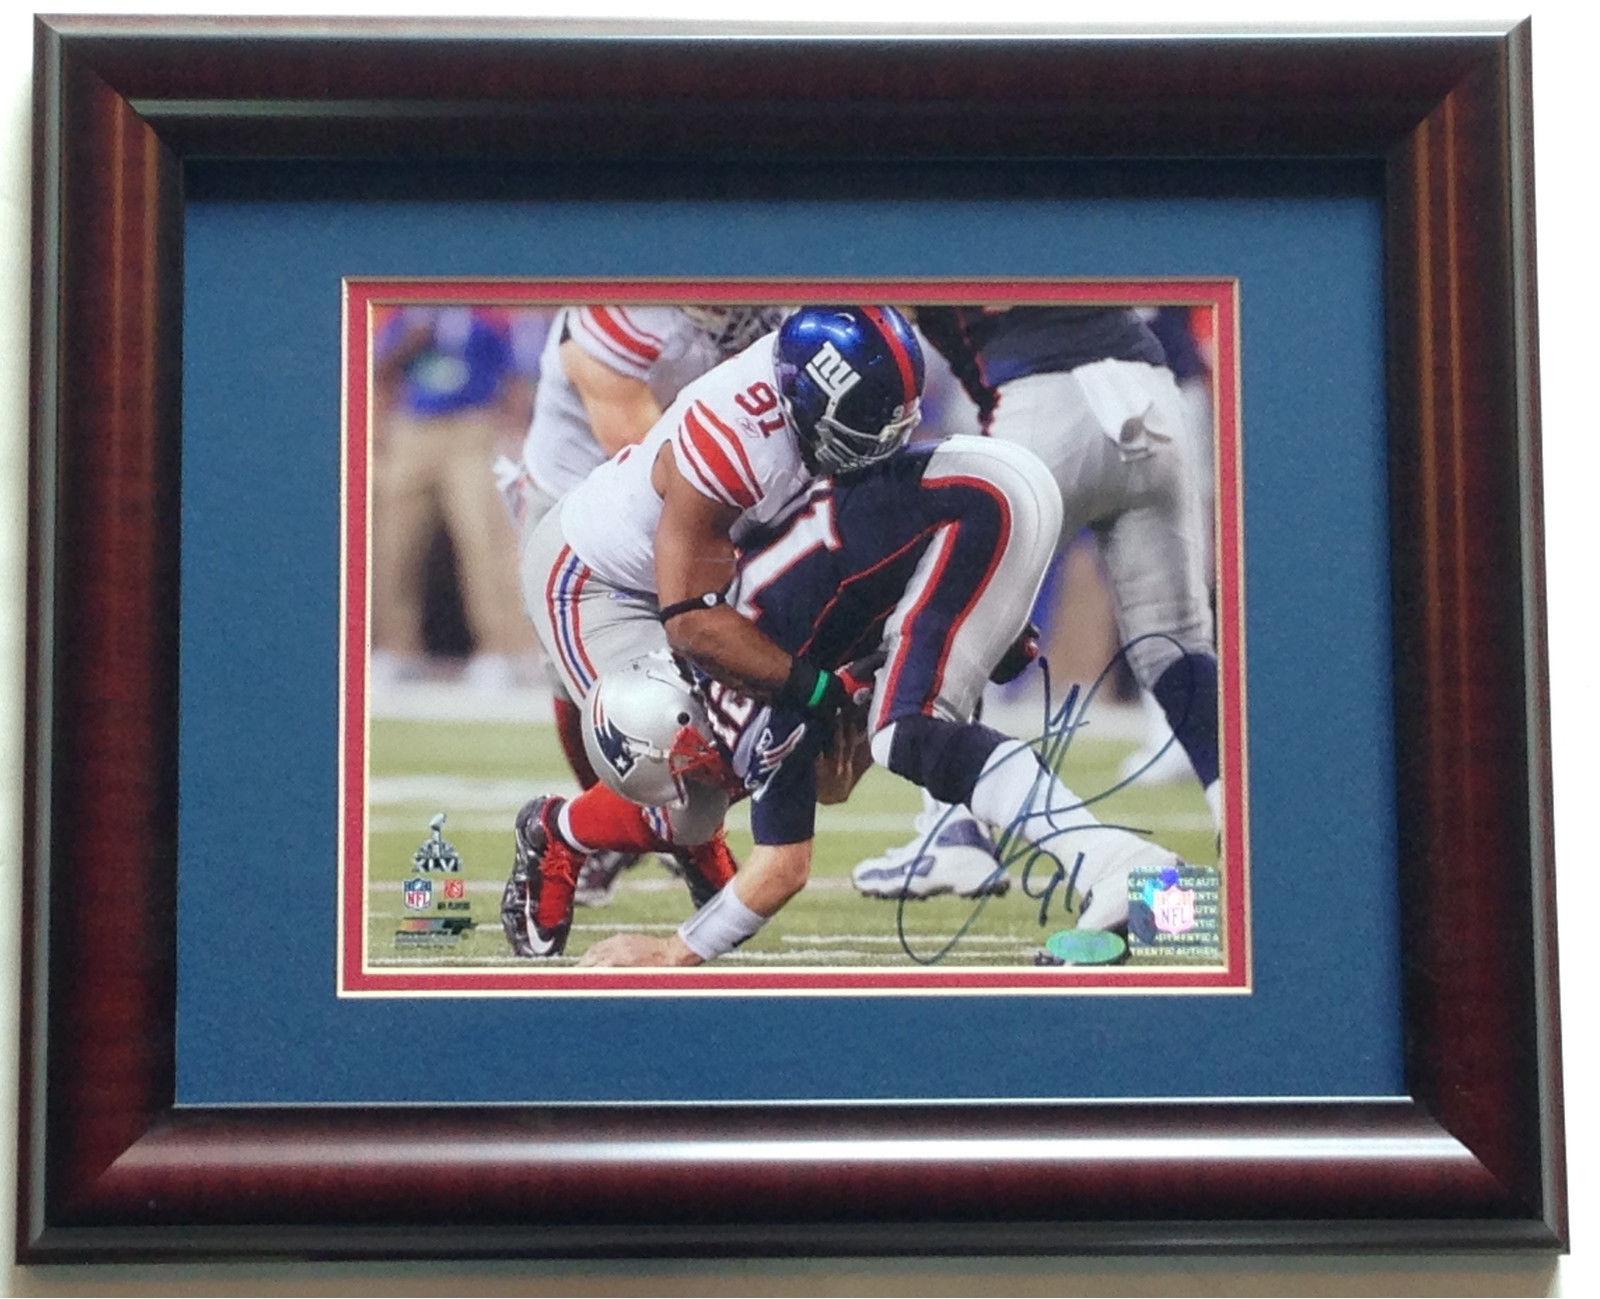 Justin Tuck NY Giants signed 8×10 photo framed SB 46 Tom Brady sack auto Steiner